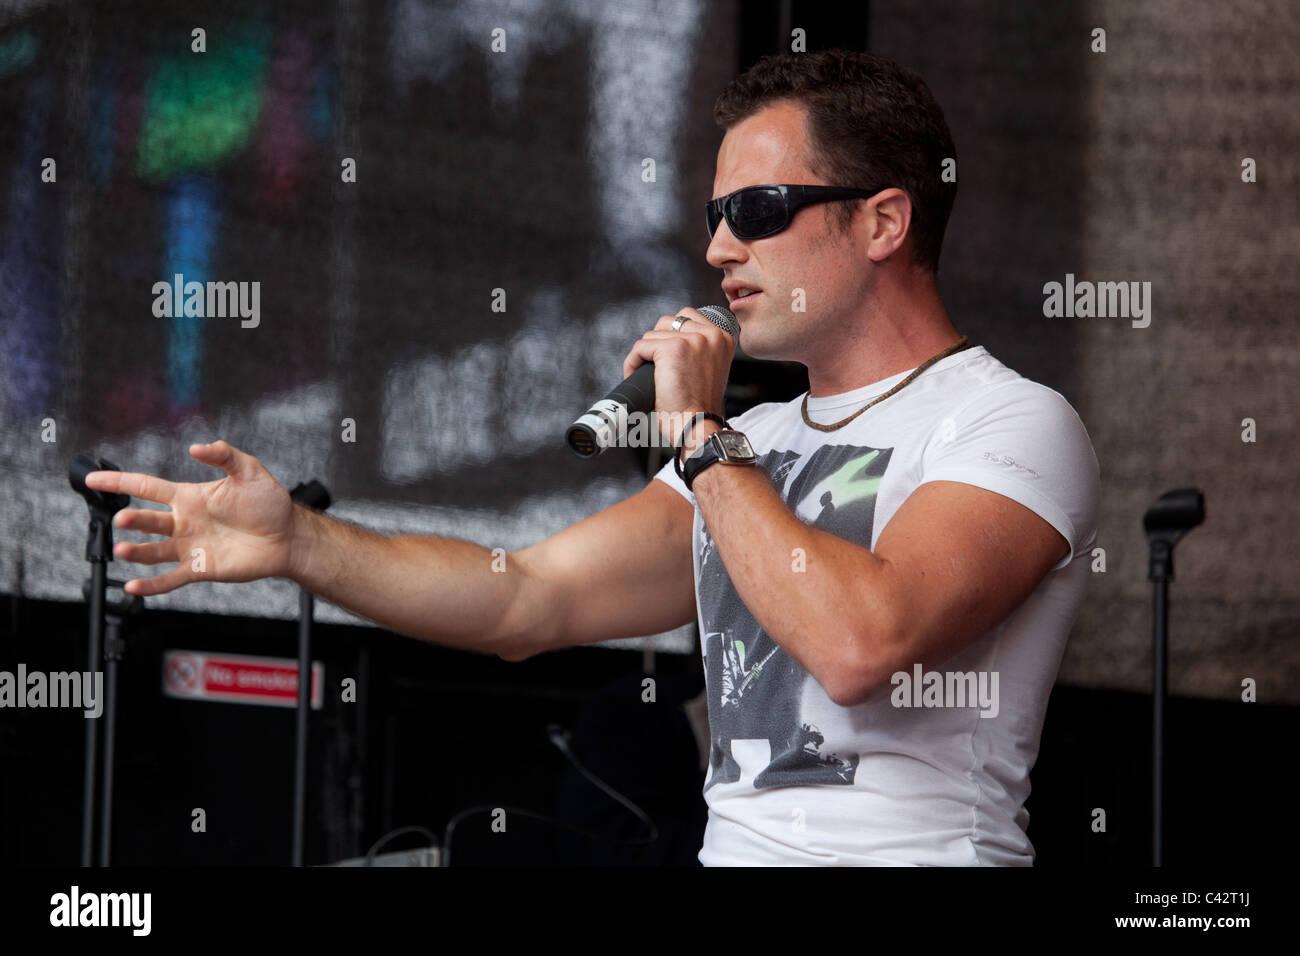 Singer Jamie Connolly at Birmingham Gay Pride 2011. - Stock Image